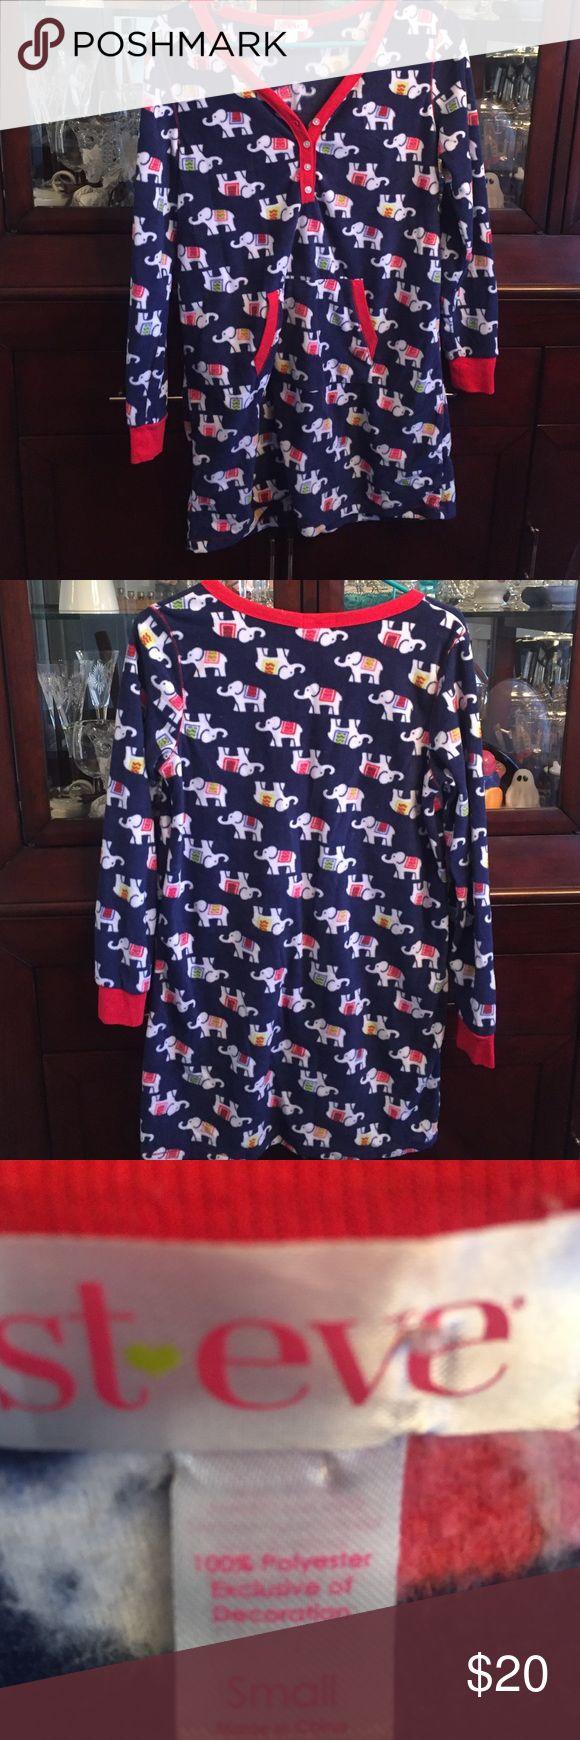 Like new St Eve flannel nite shirt Cute nite shirt Intimates & Sleepwear Shapewear